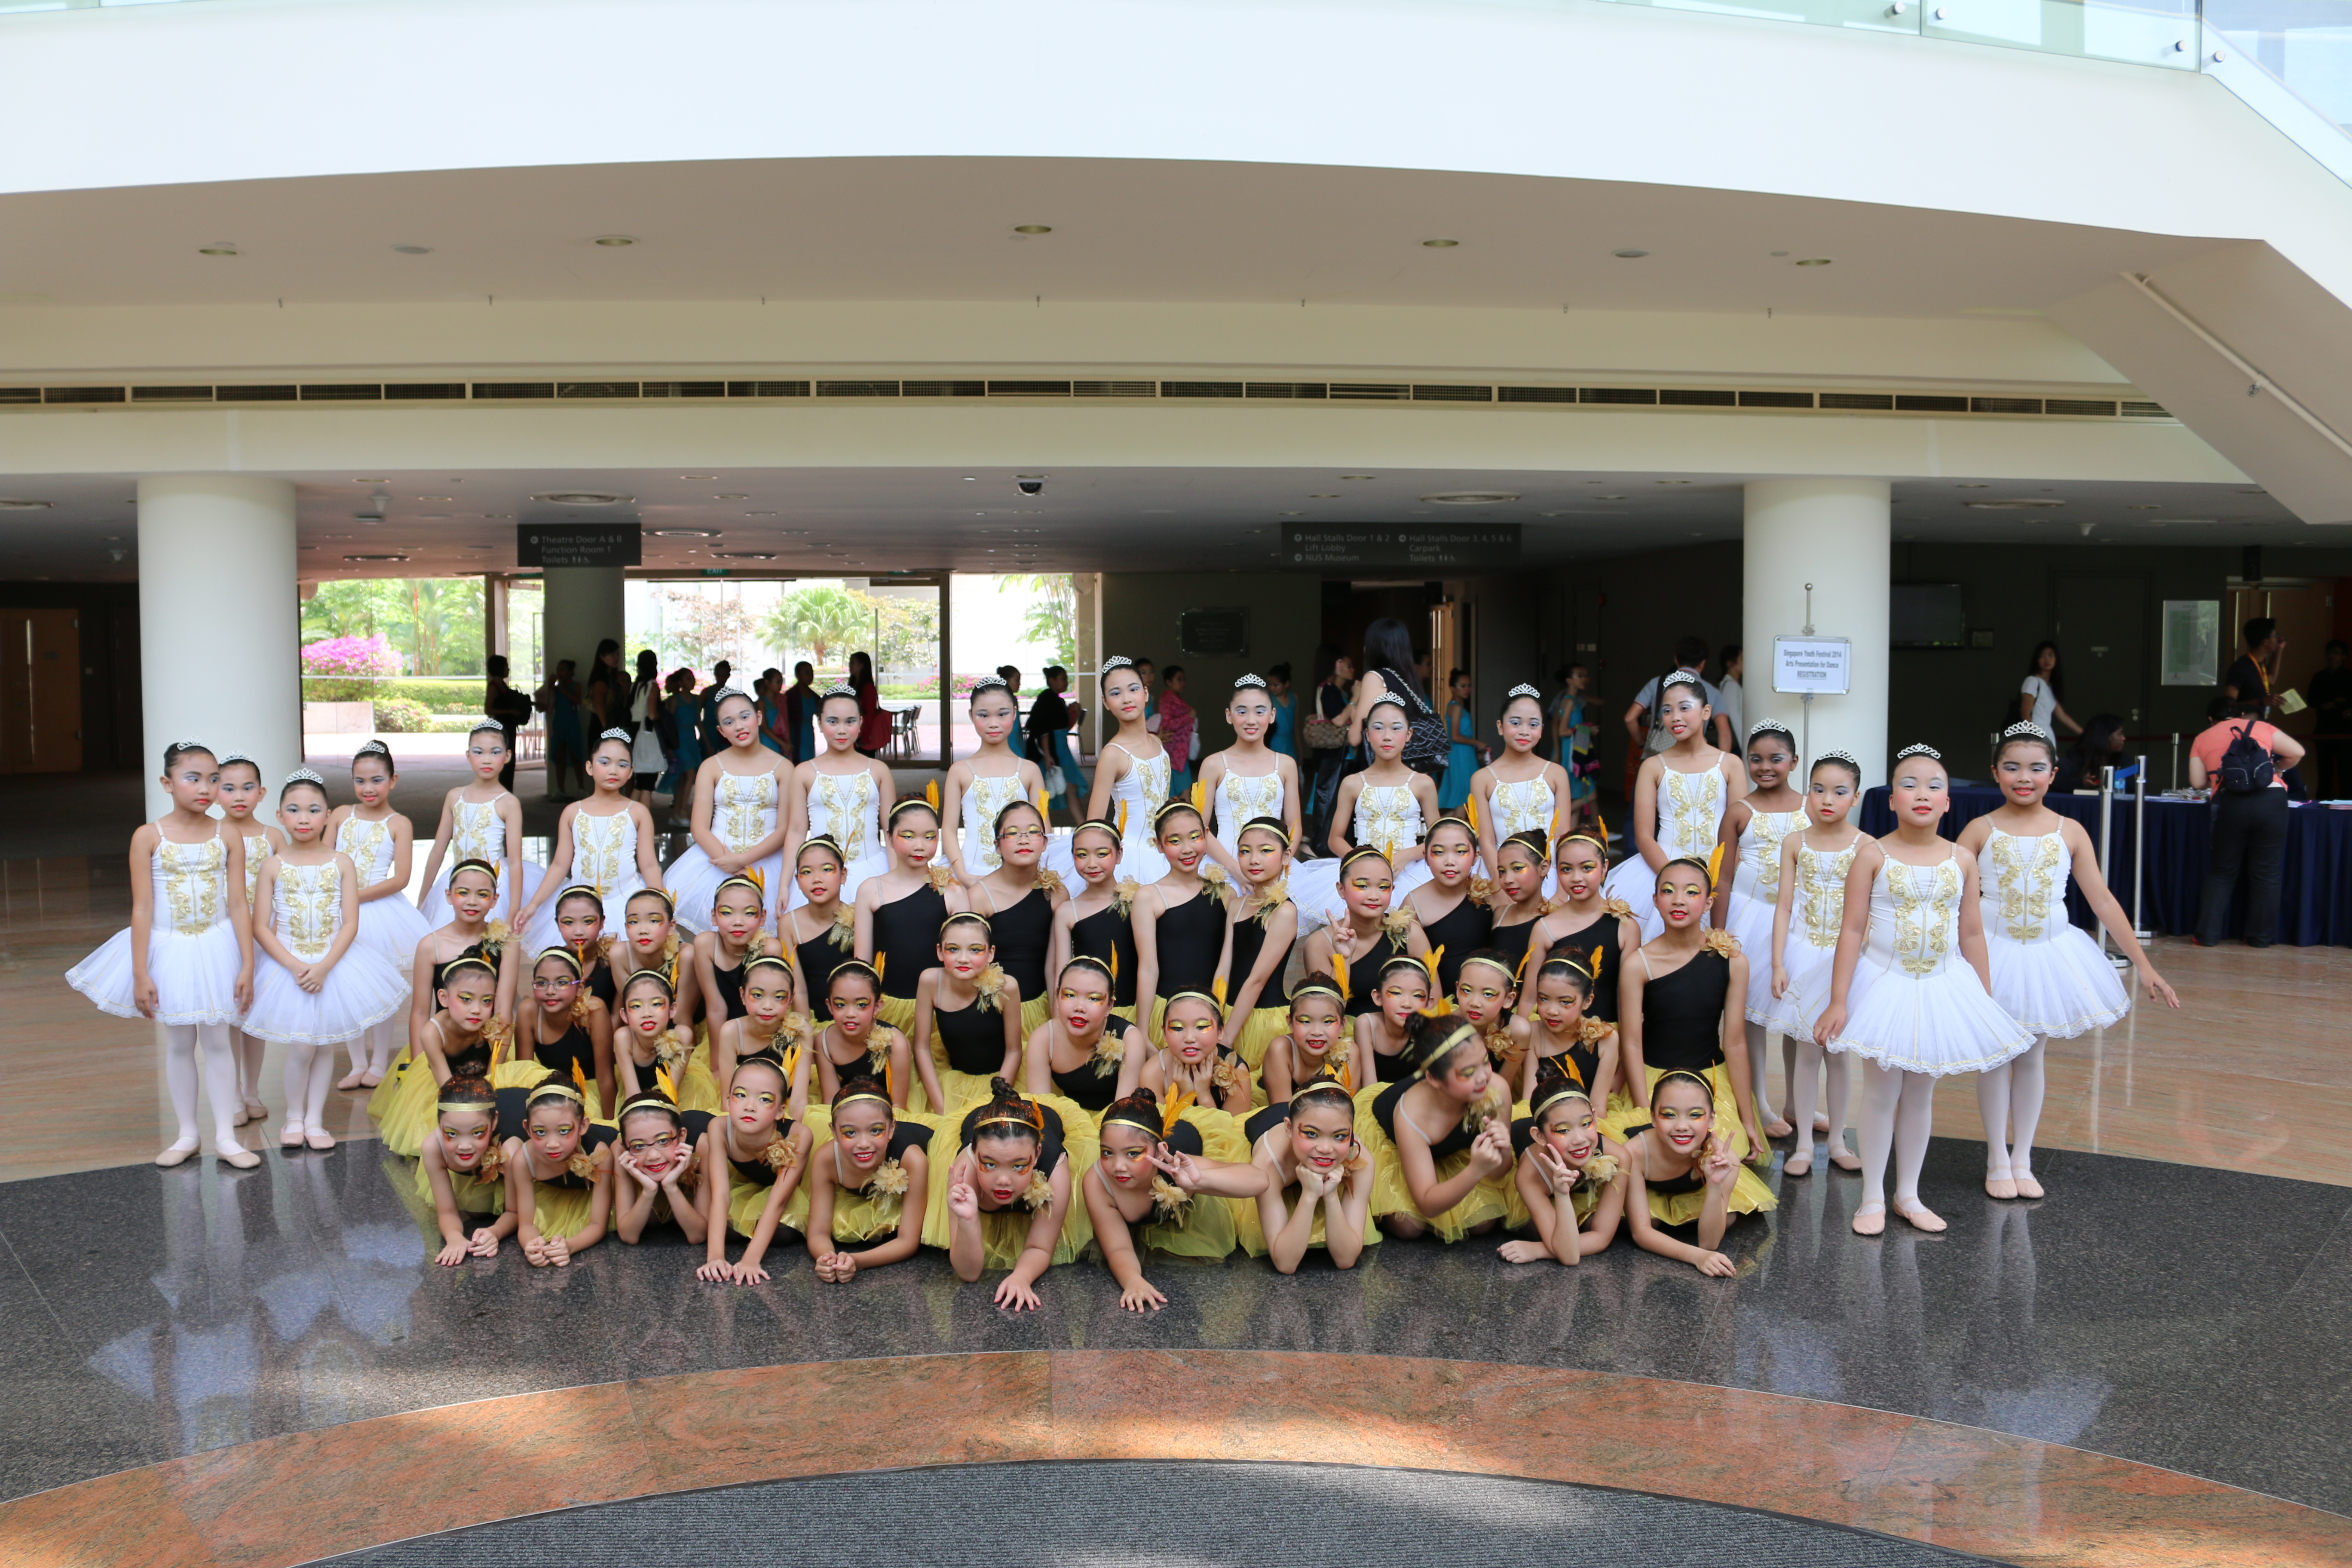 De La Salle School SYF 2014